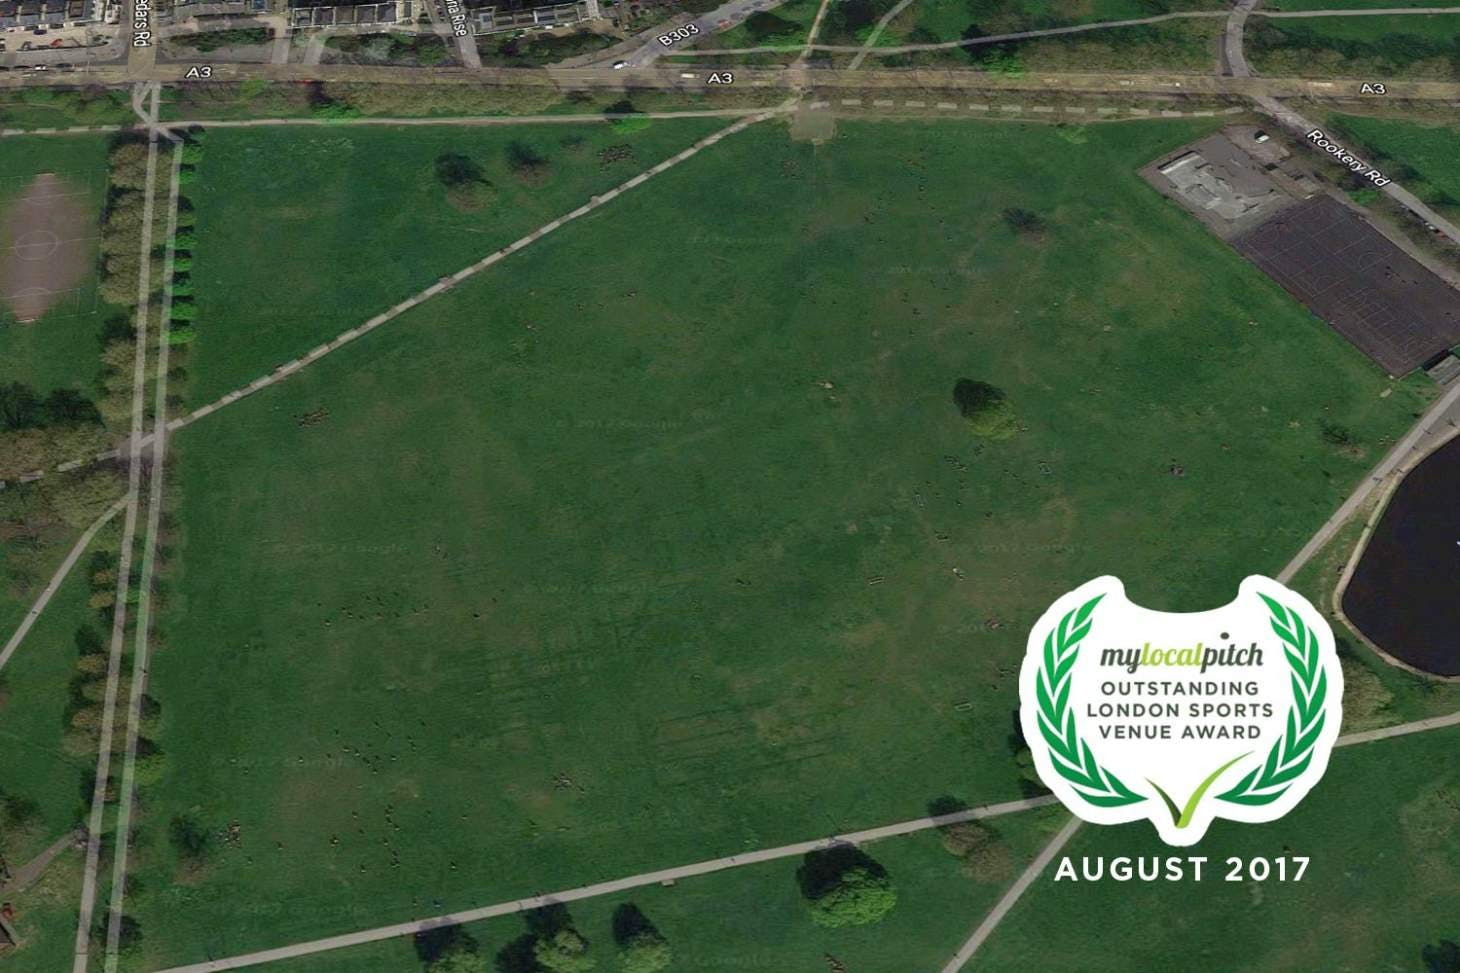 Clapham Common Nets | Artificial cricket facilities